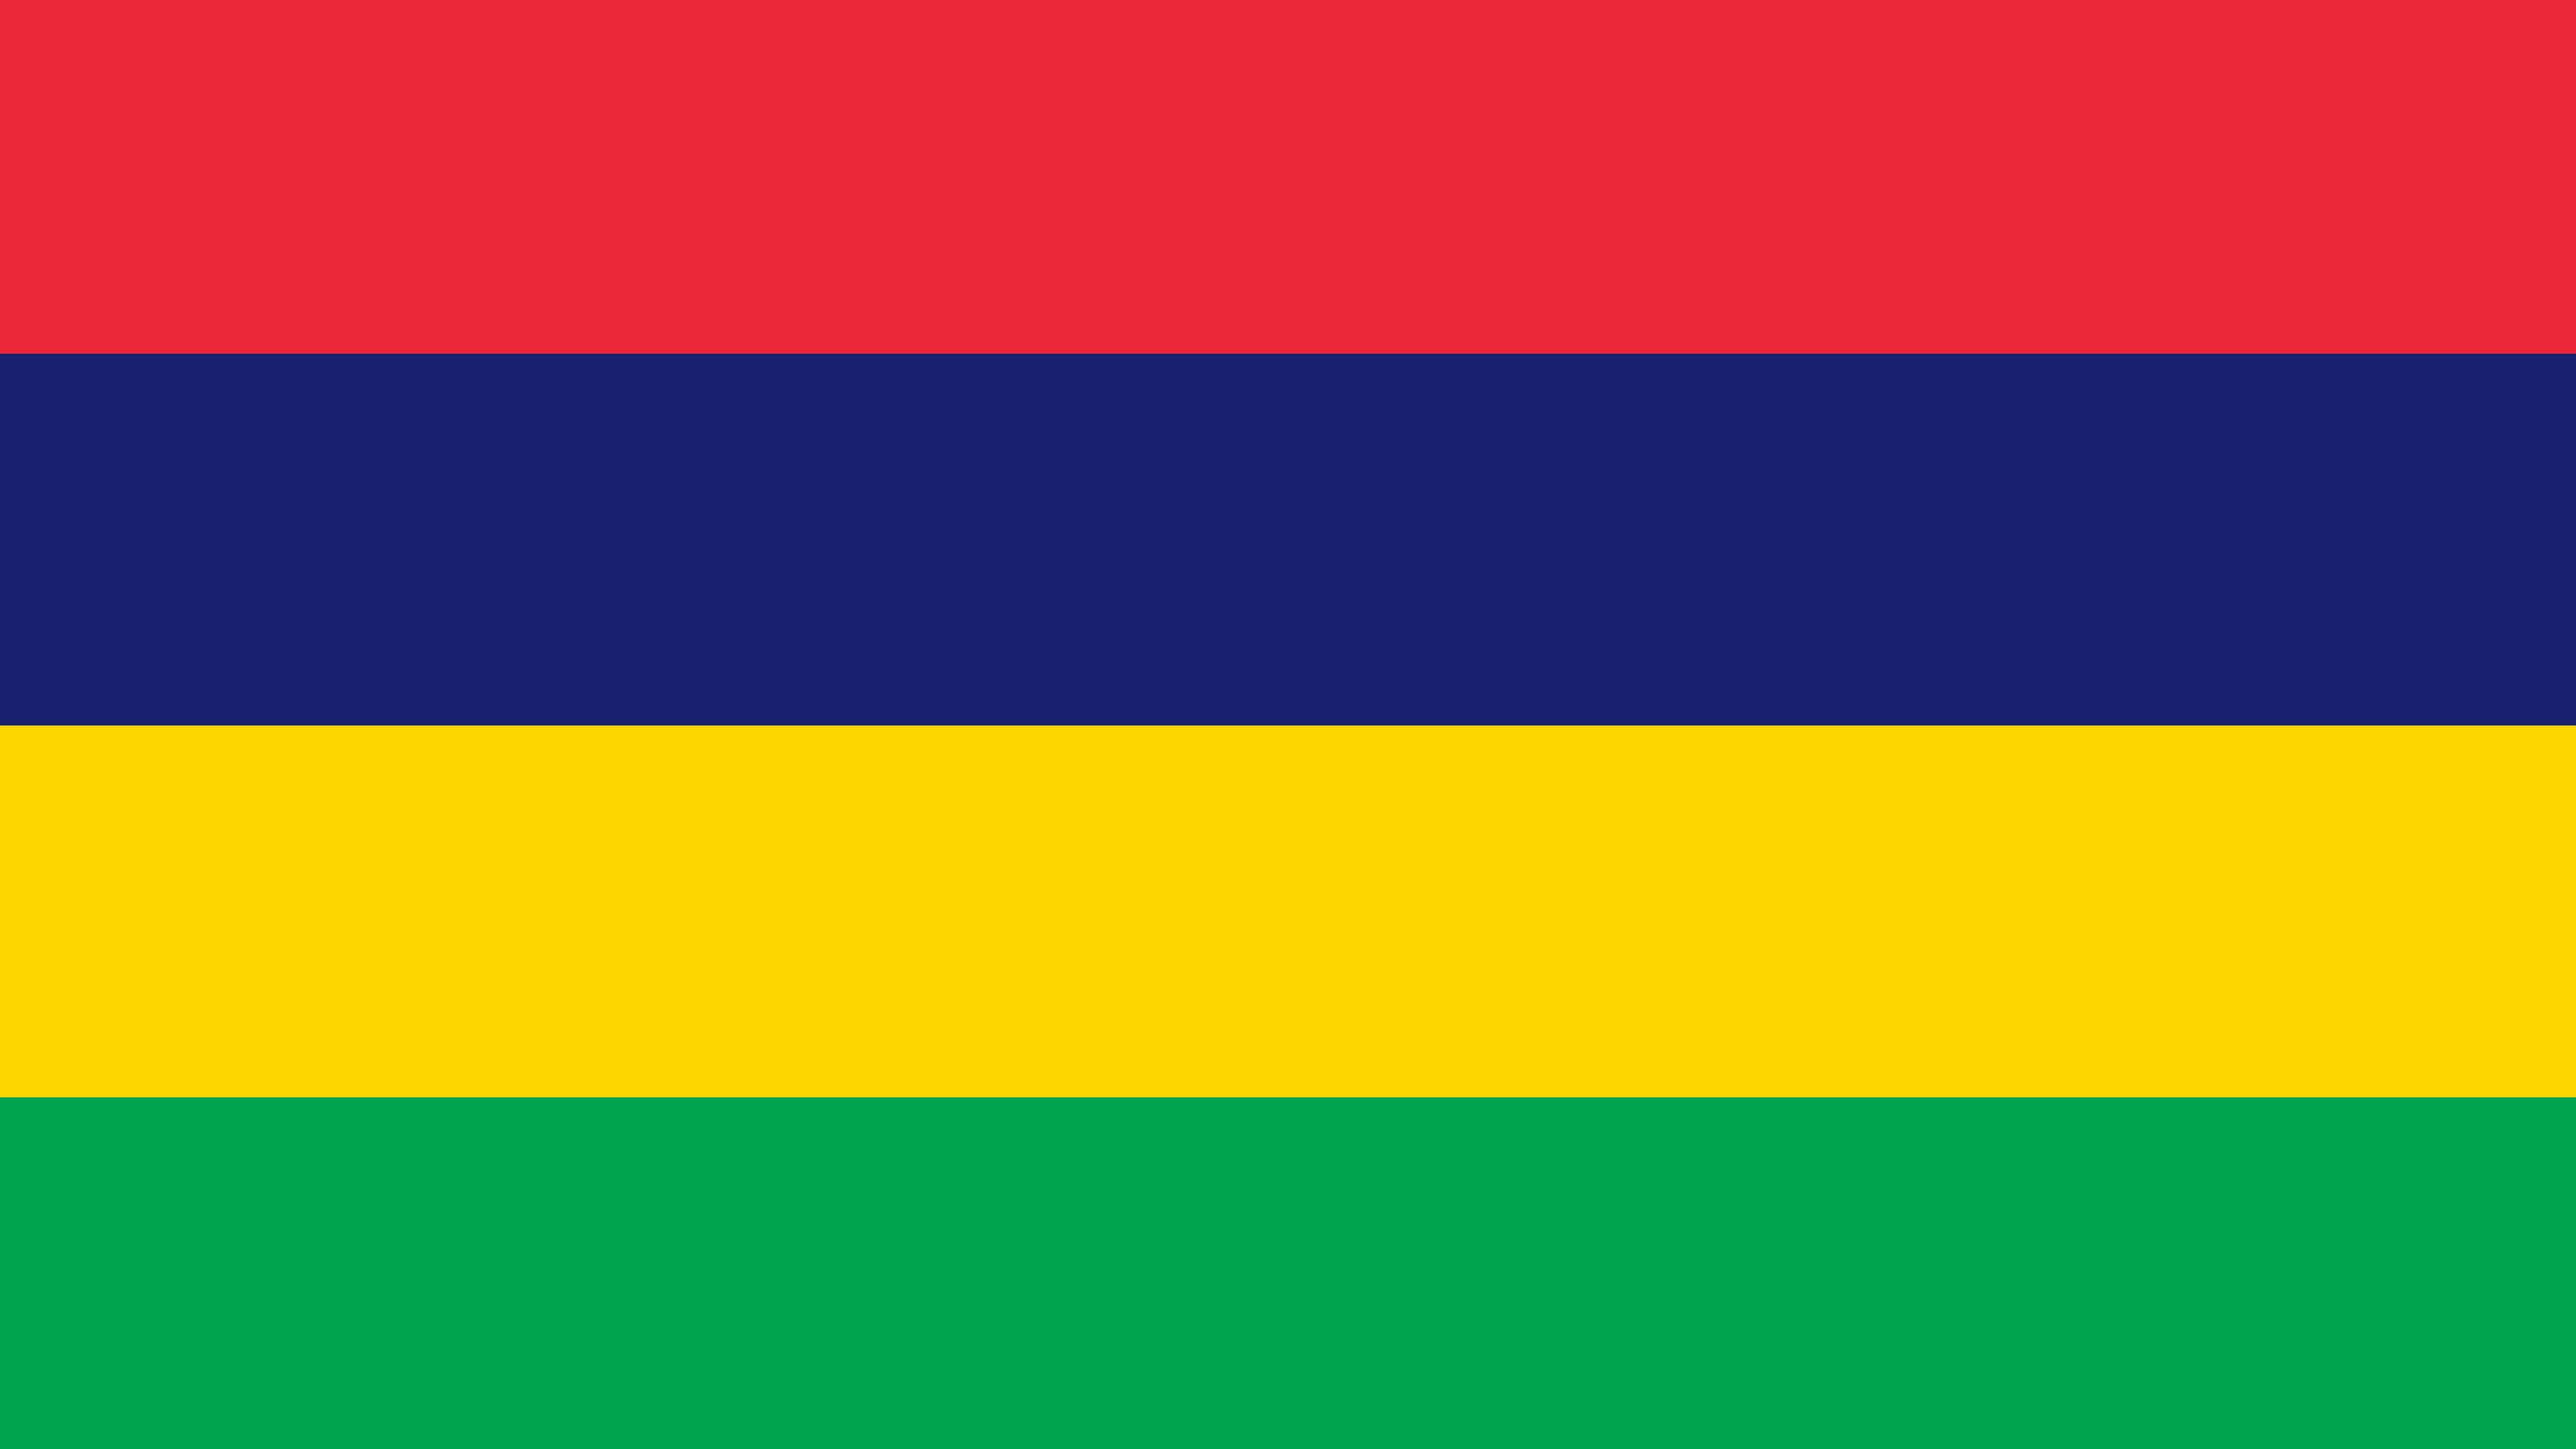 mauritius flag uhd 4k wallpaper